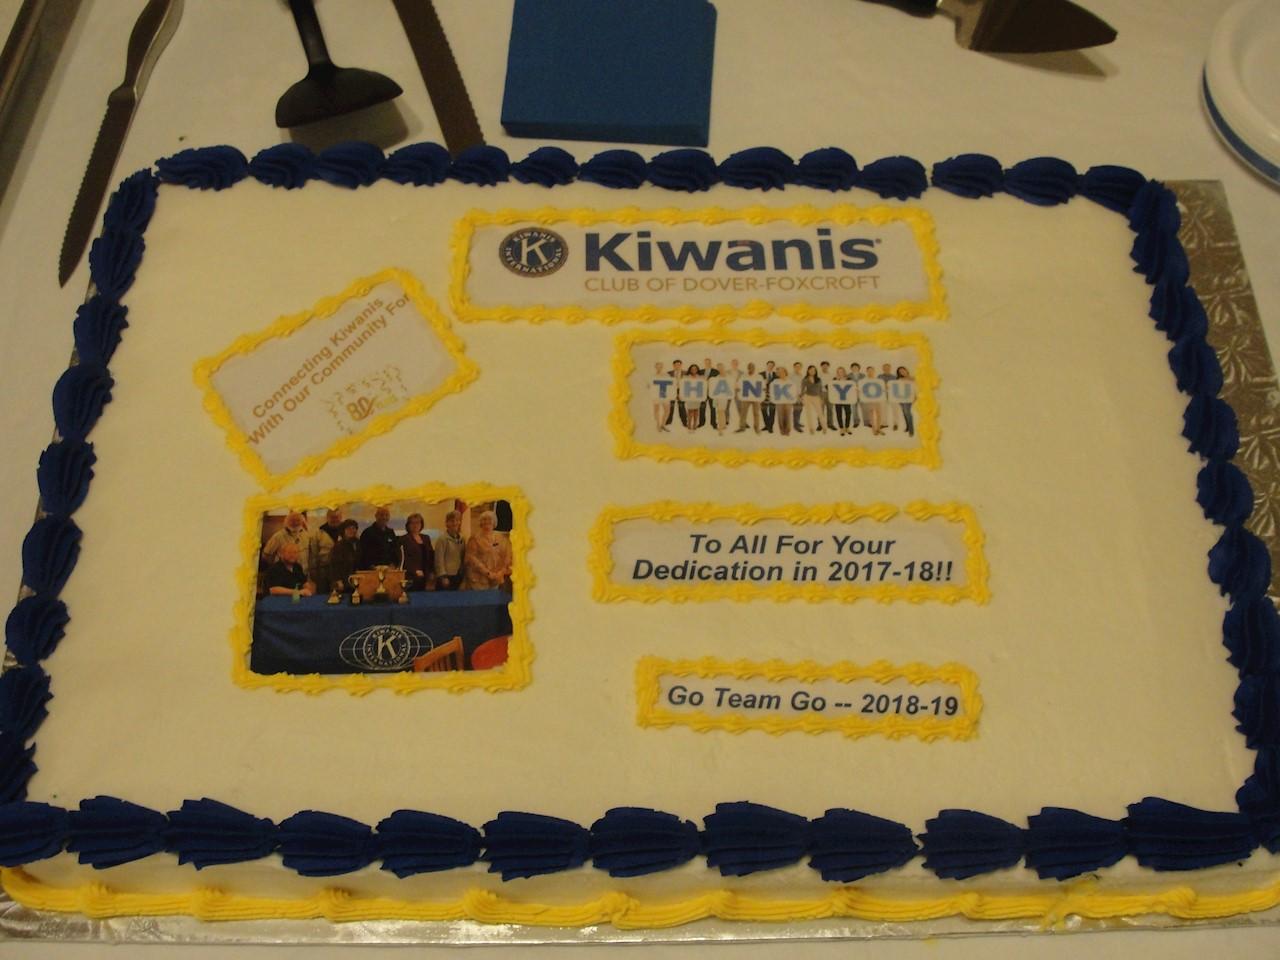 Dover-Foxcroft - Kiwanis International